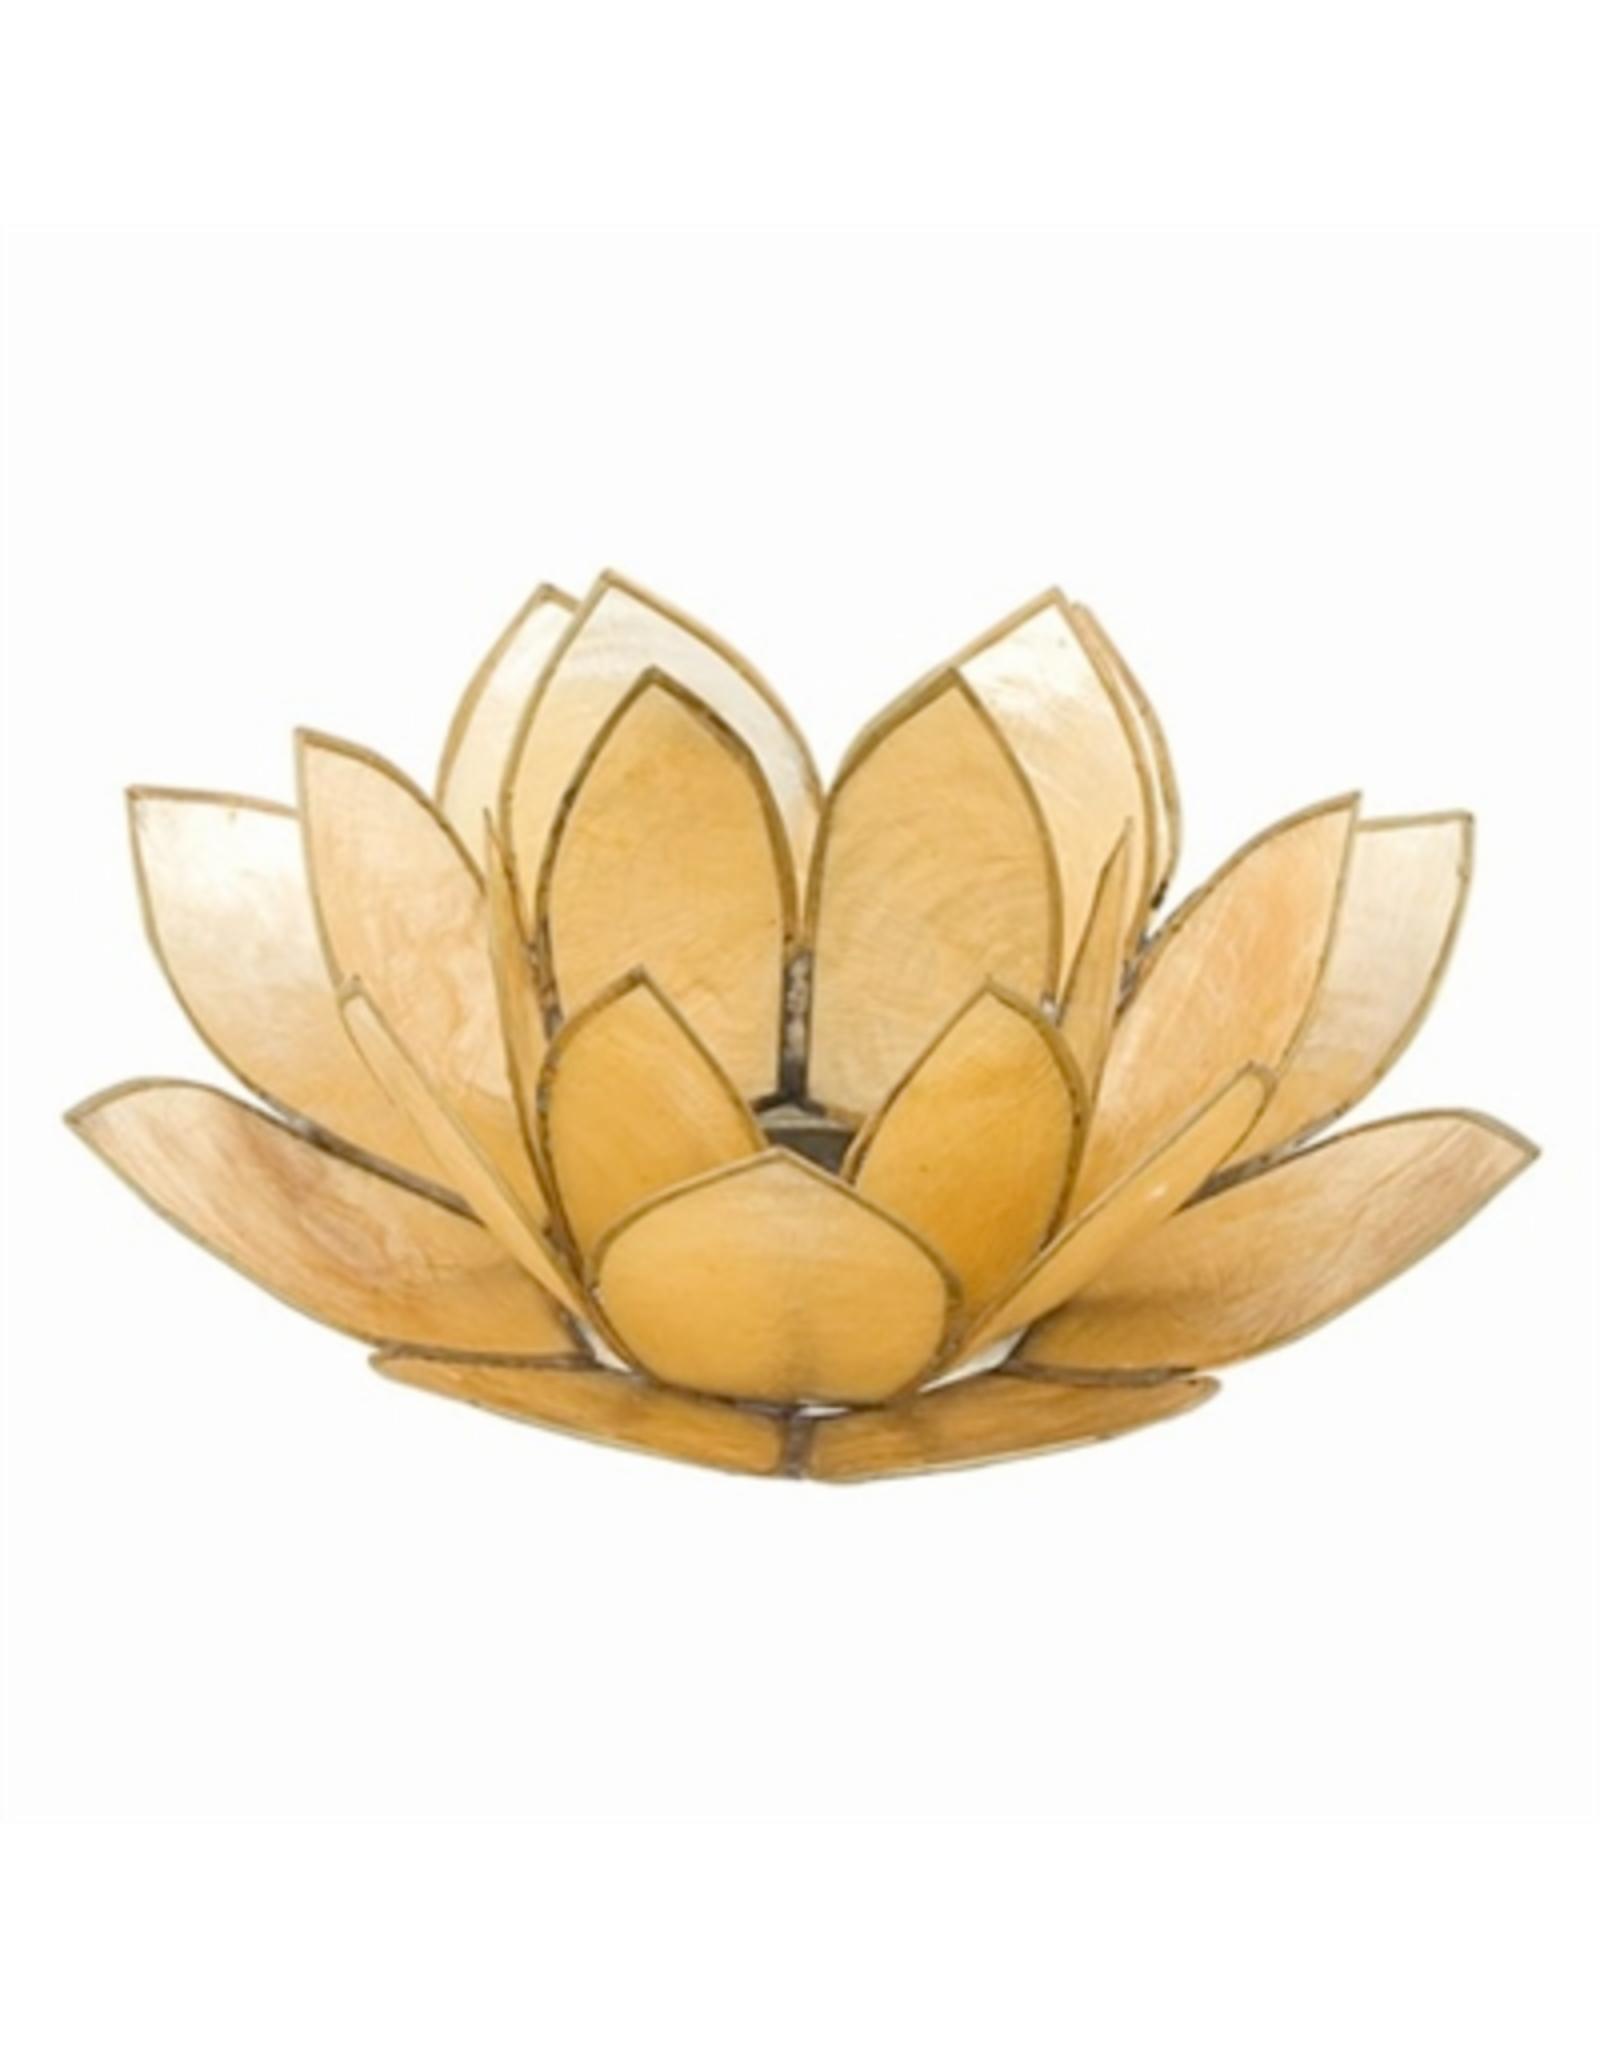 CANDLE-TEALIGHT HOLDER, PEARL LOTUS FLOWER,